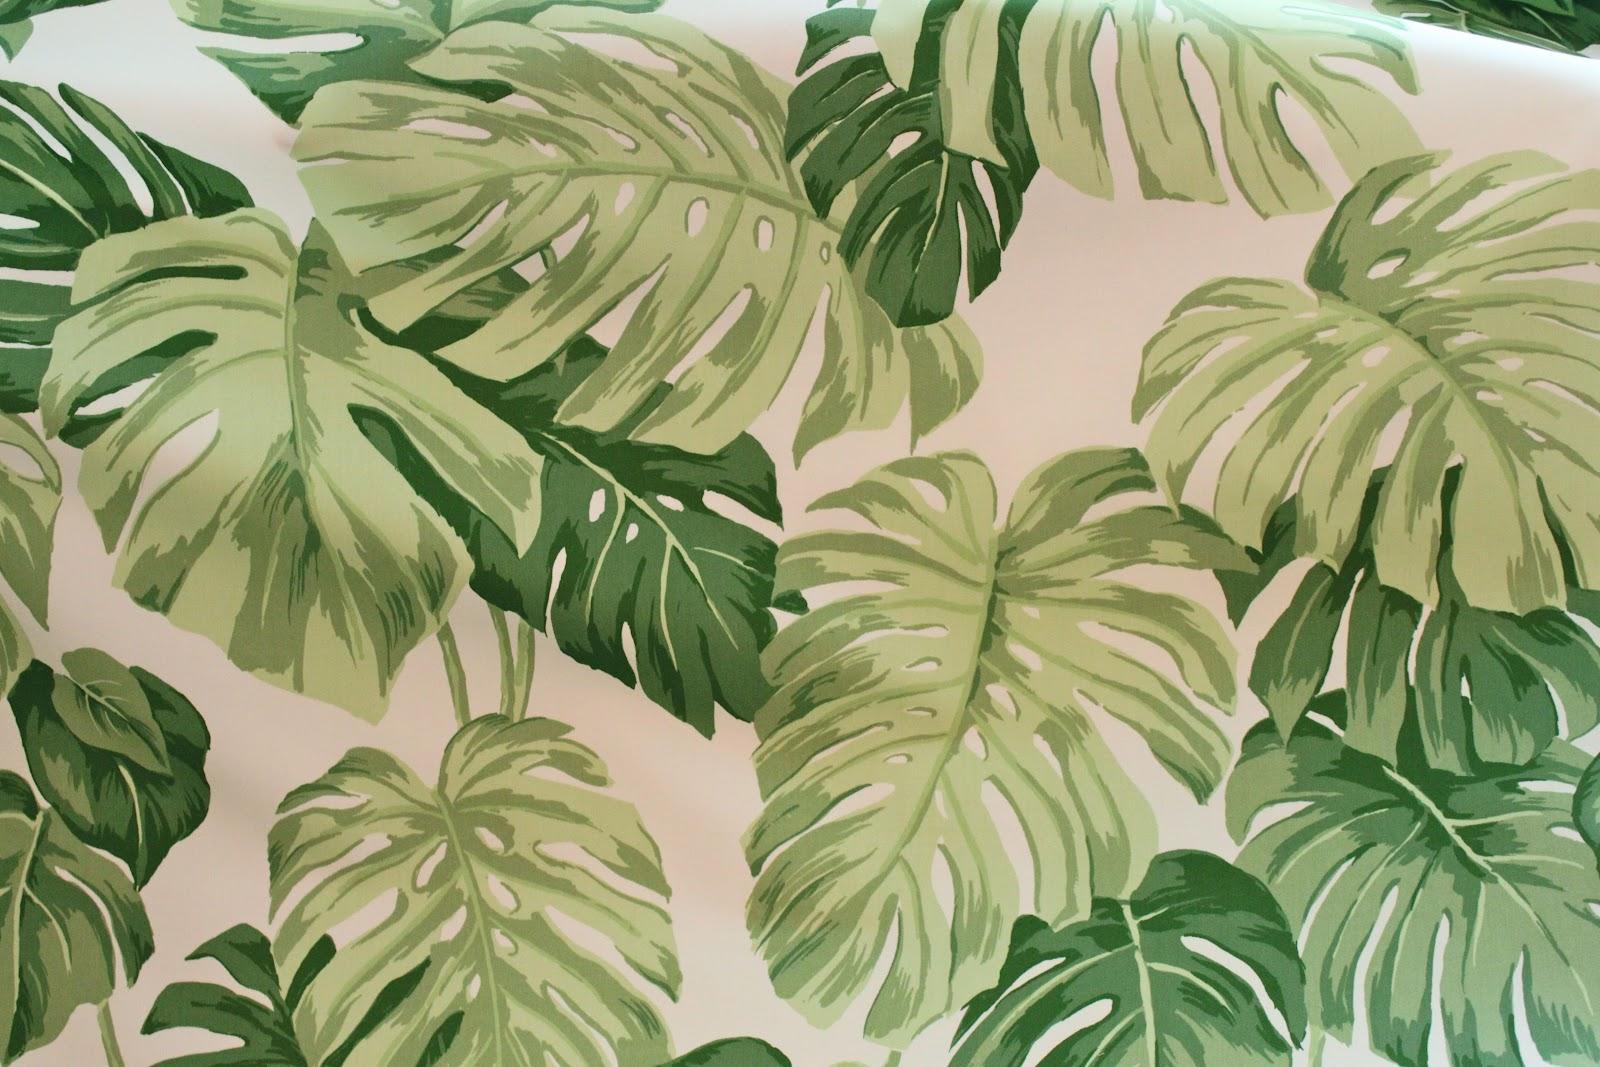 buy thibaut wallpaper online portugal thibaut online shop uk thibaut 1600x1067